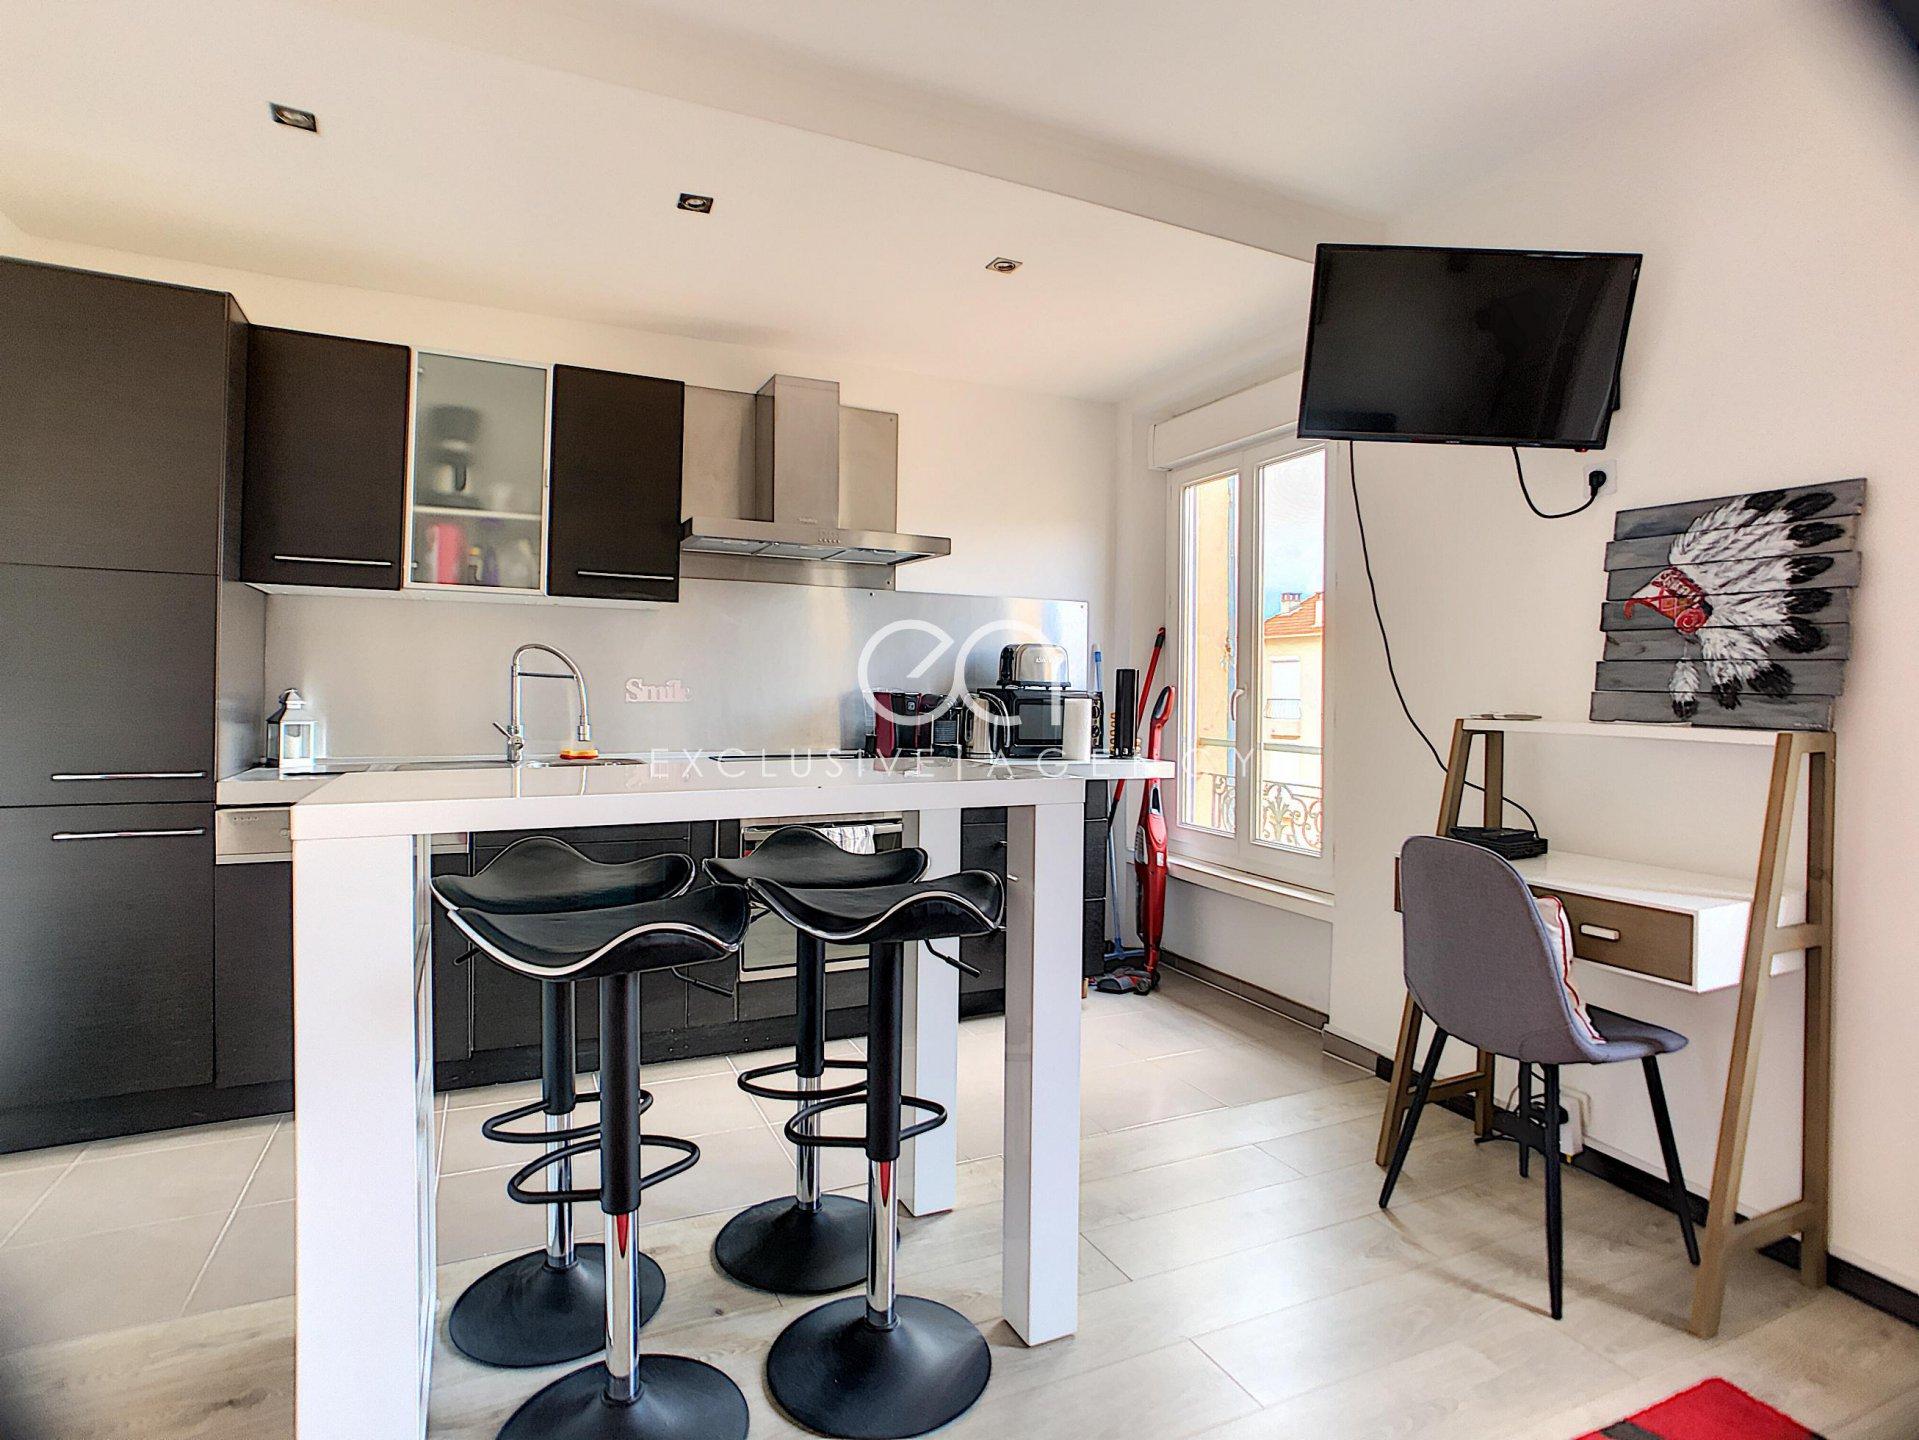 Ferieutleie Duplex-leilighet - Cannes Banane